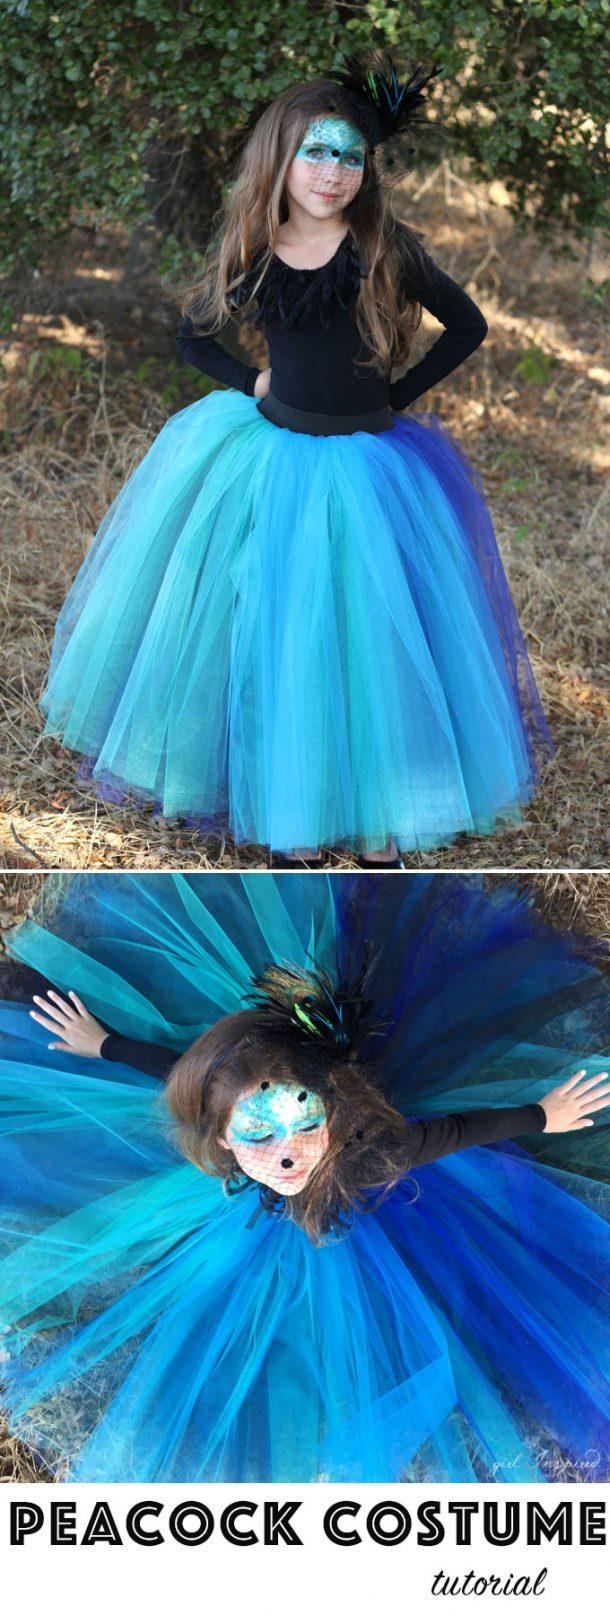 DIY Halloween Costumes Ideas - Beautiful and EASY Peacock Long Tutu Costume DIY Tutorial via girl. Inspired.